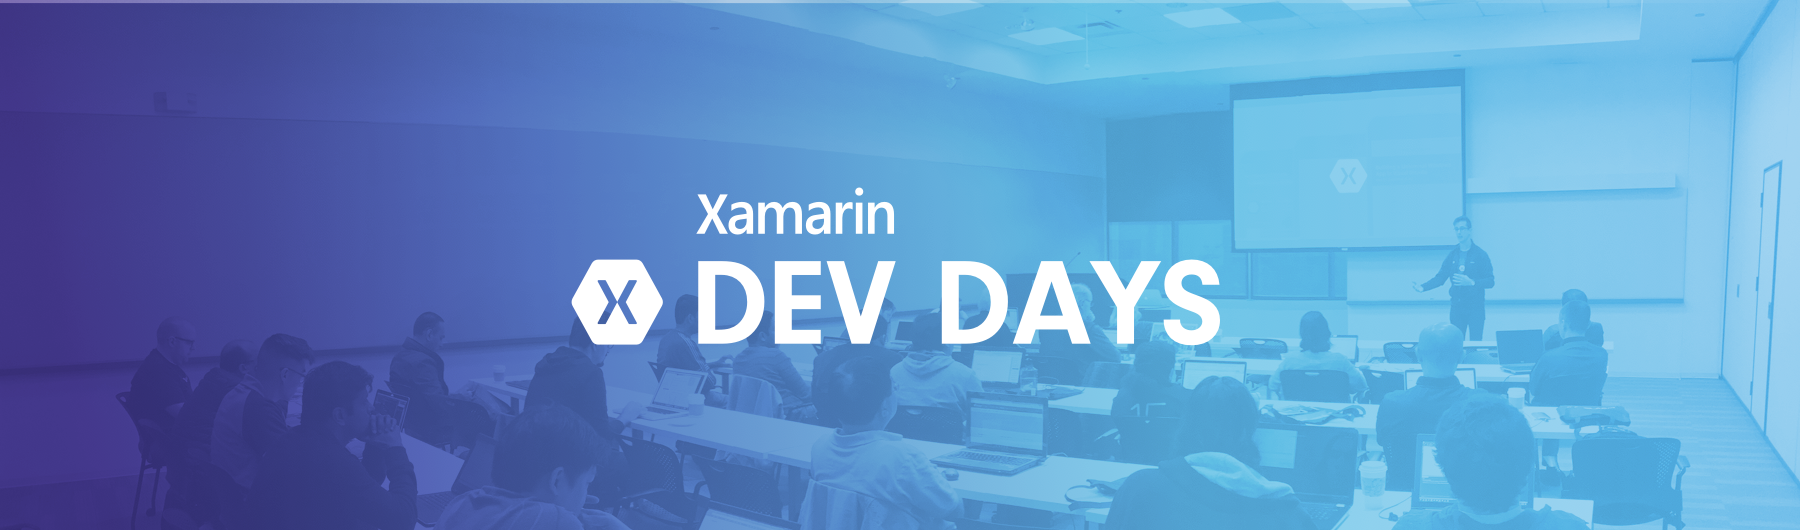 Xamarin Dev Days - Cologne